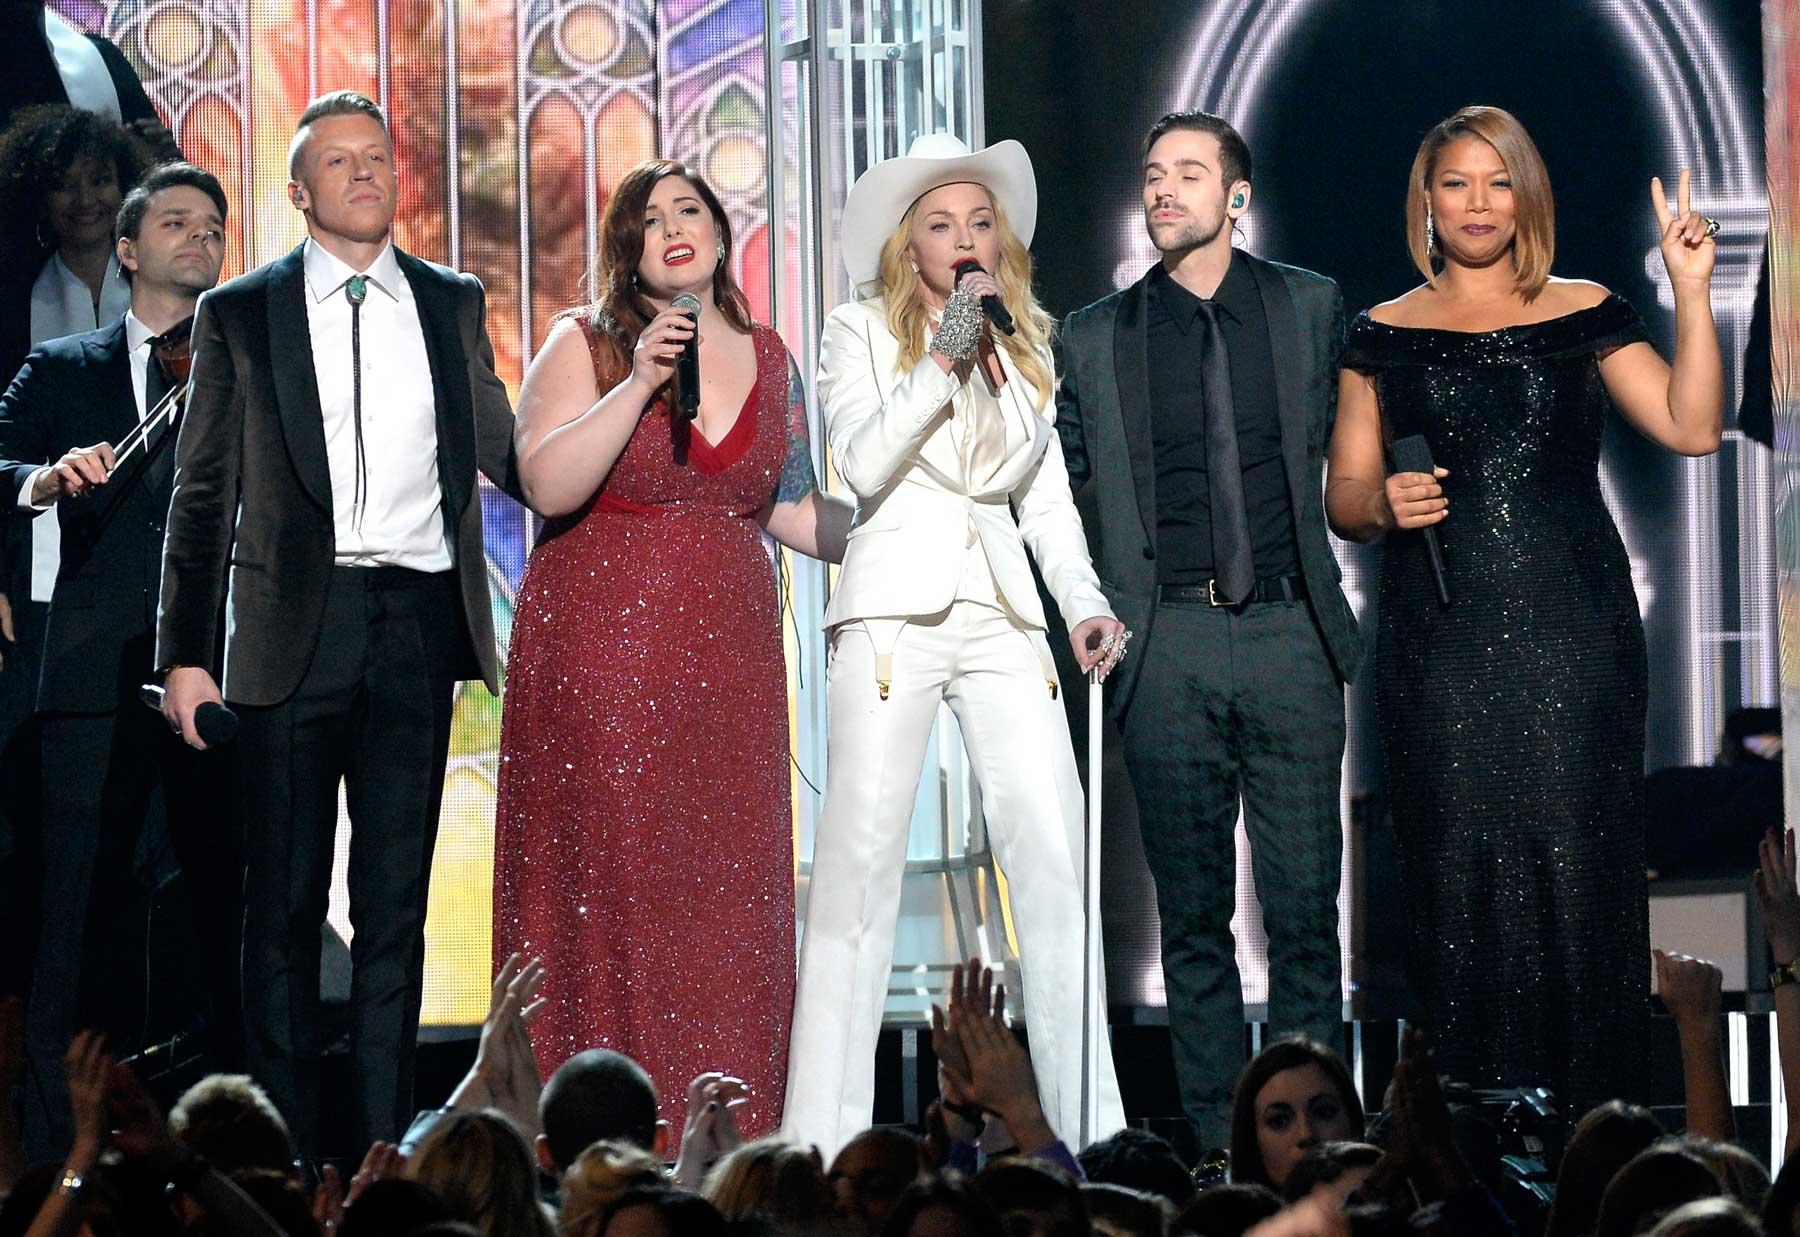 Macklemore, Queen Latifah Turn 'Same Love' Into Mass Grammy Wedding